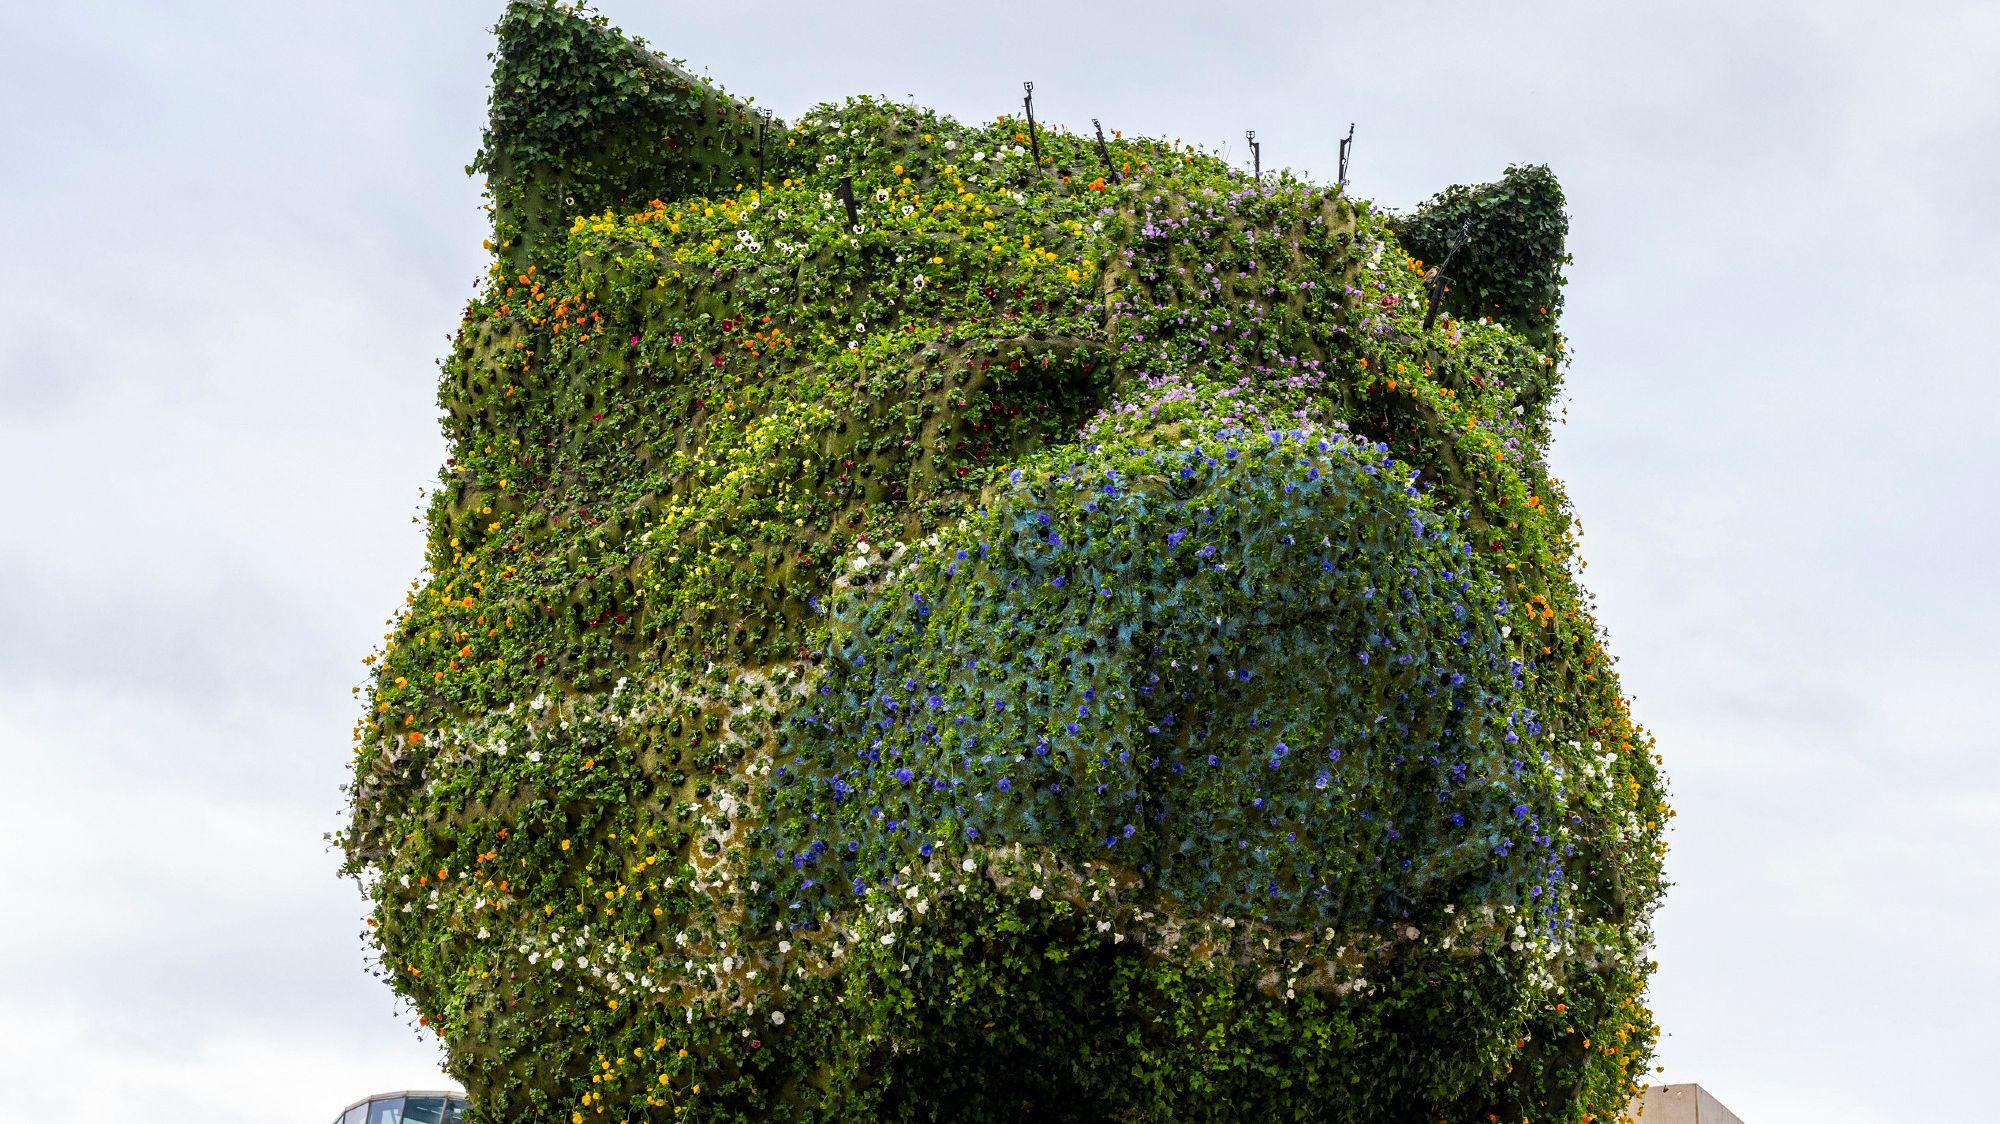 Jeff Koons's <em>Puppy</em> Sculpture, at the Guggenheim Museum Bilbao, Is Donning a Face Mask